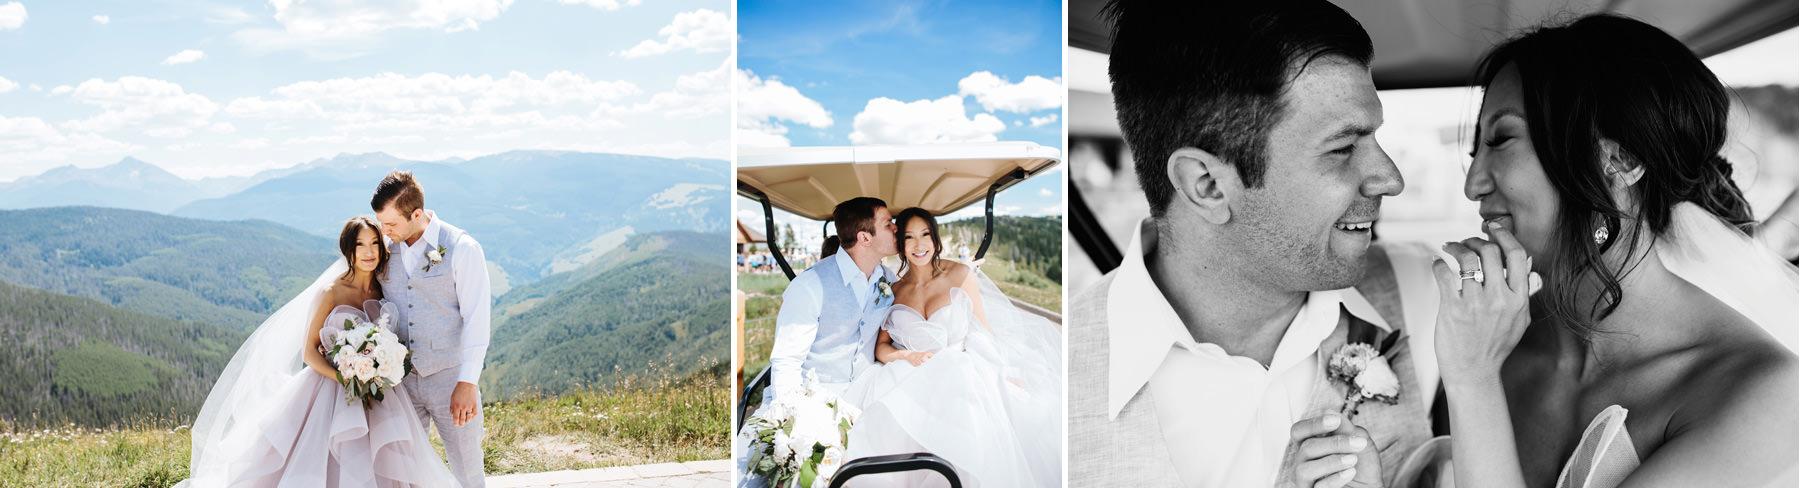 Vail Colorado Wedding Deck_ Kindling Wedding Photography45.JPG